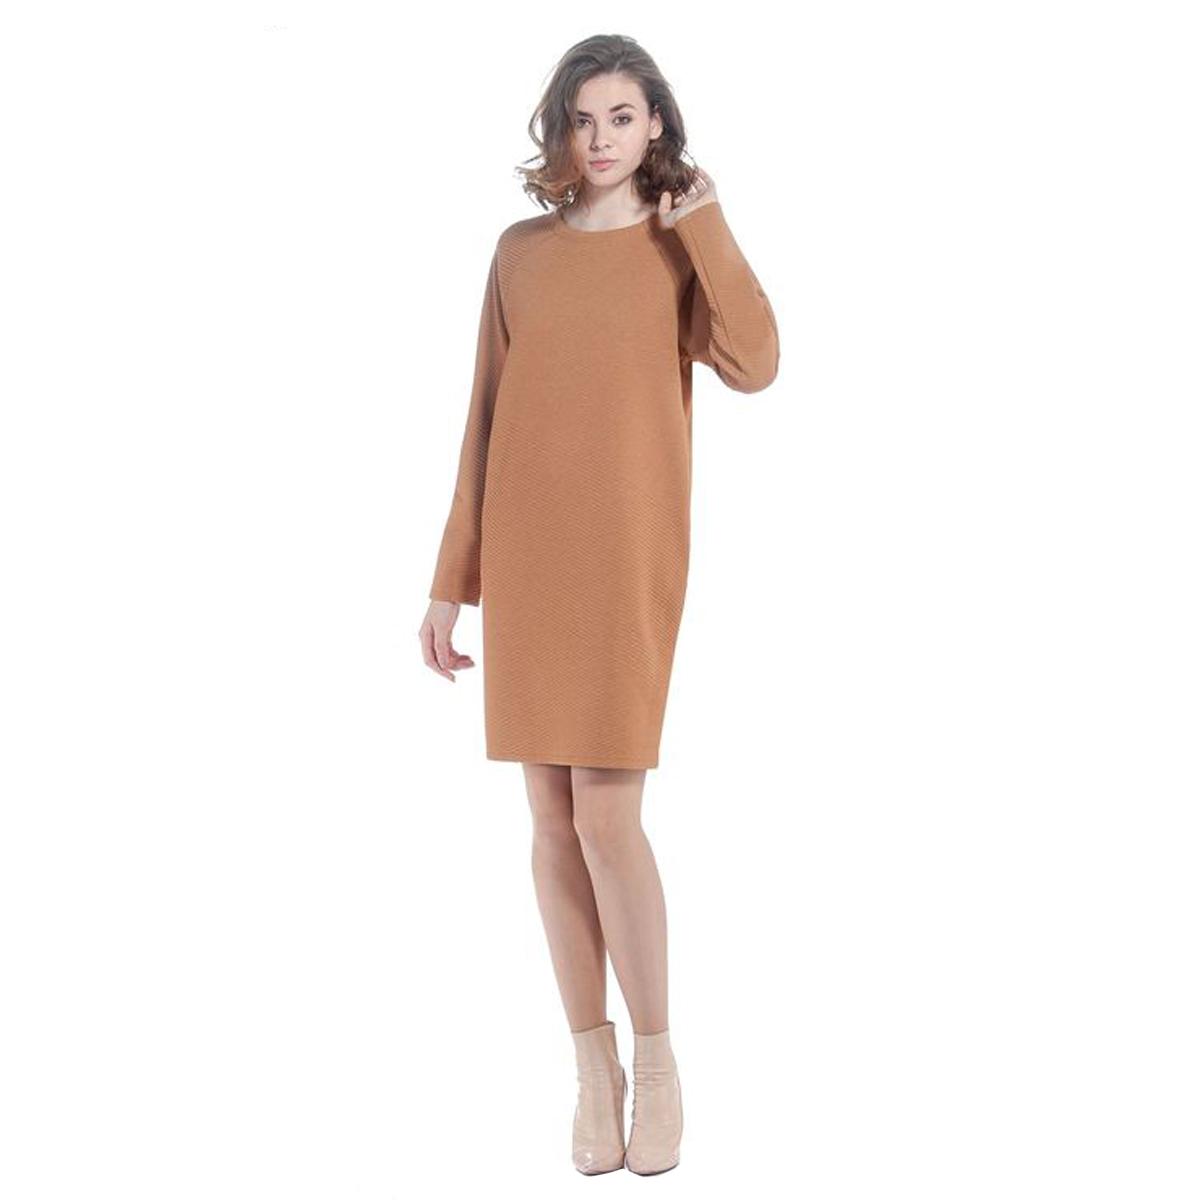 Платье KISLIS, 8054а УС kislis 5529